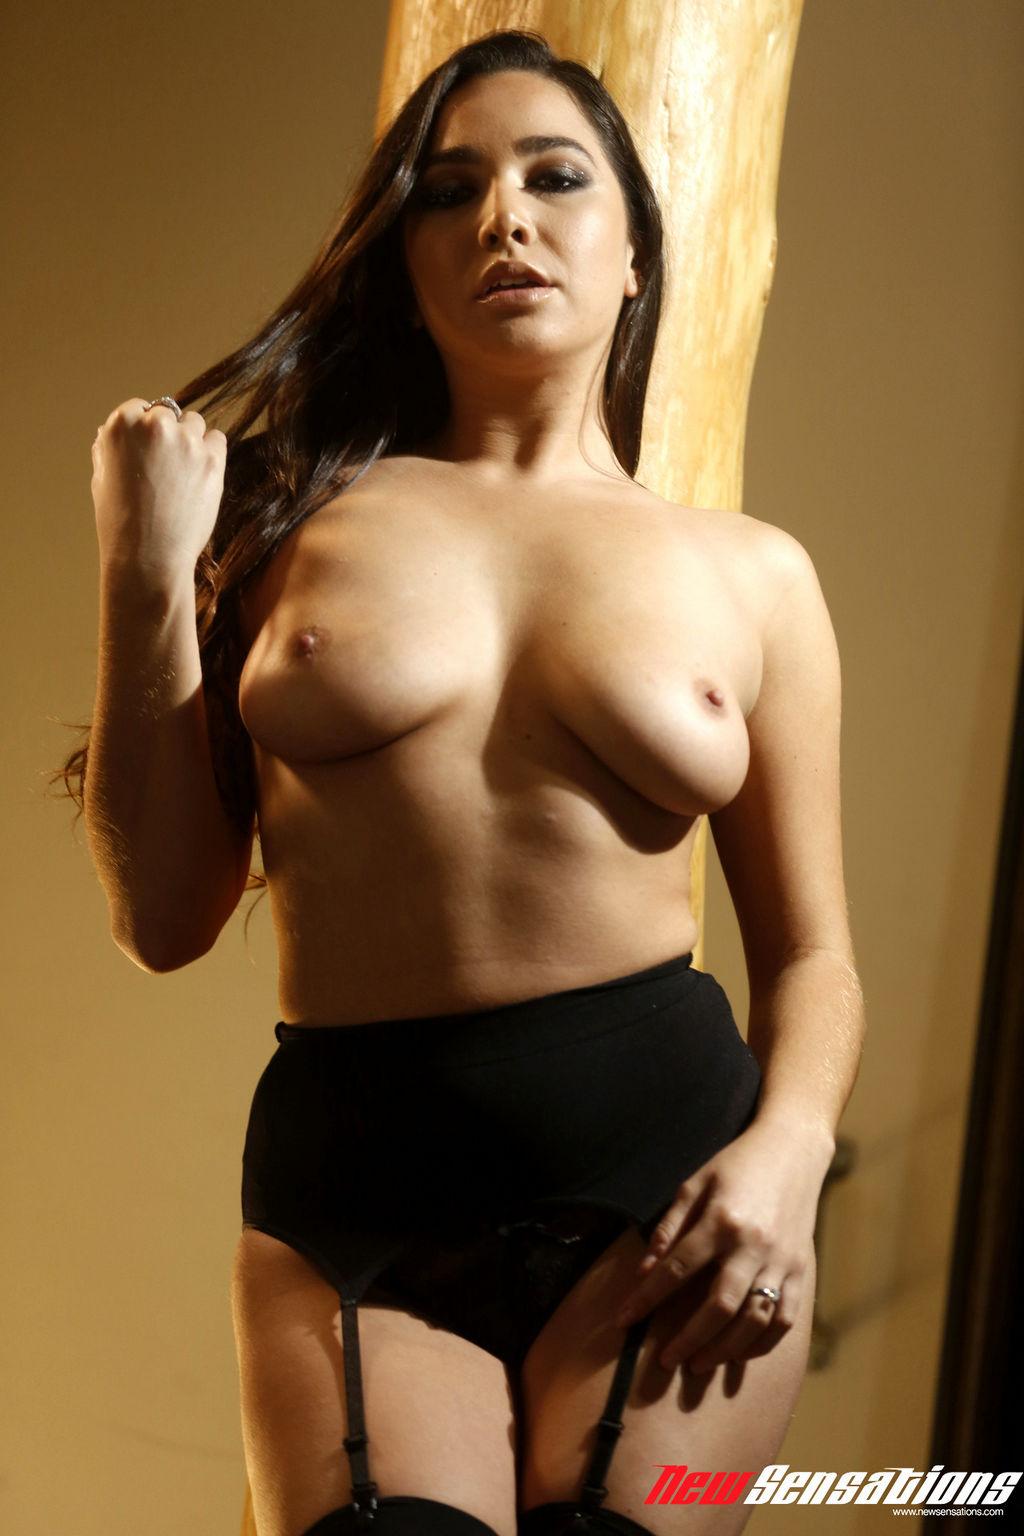 bokep BDSM cewek latina semok toket gede karlee grey diikat dan dipaksa ngentot,cewek semok memekai lingerie